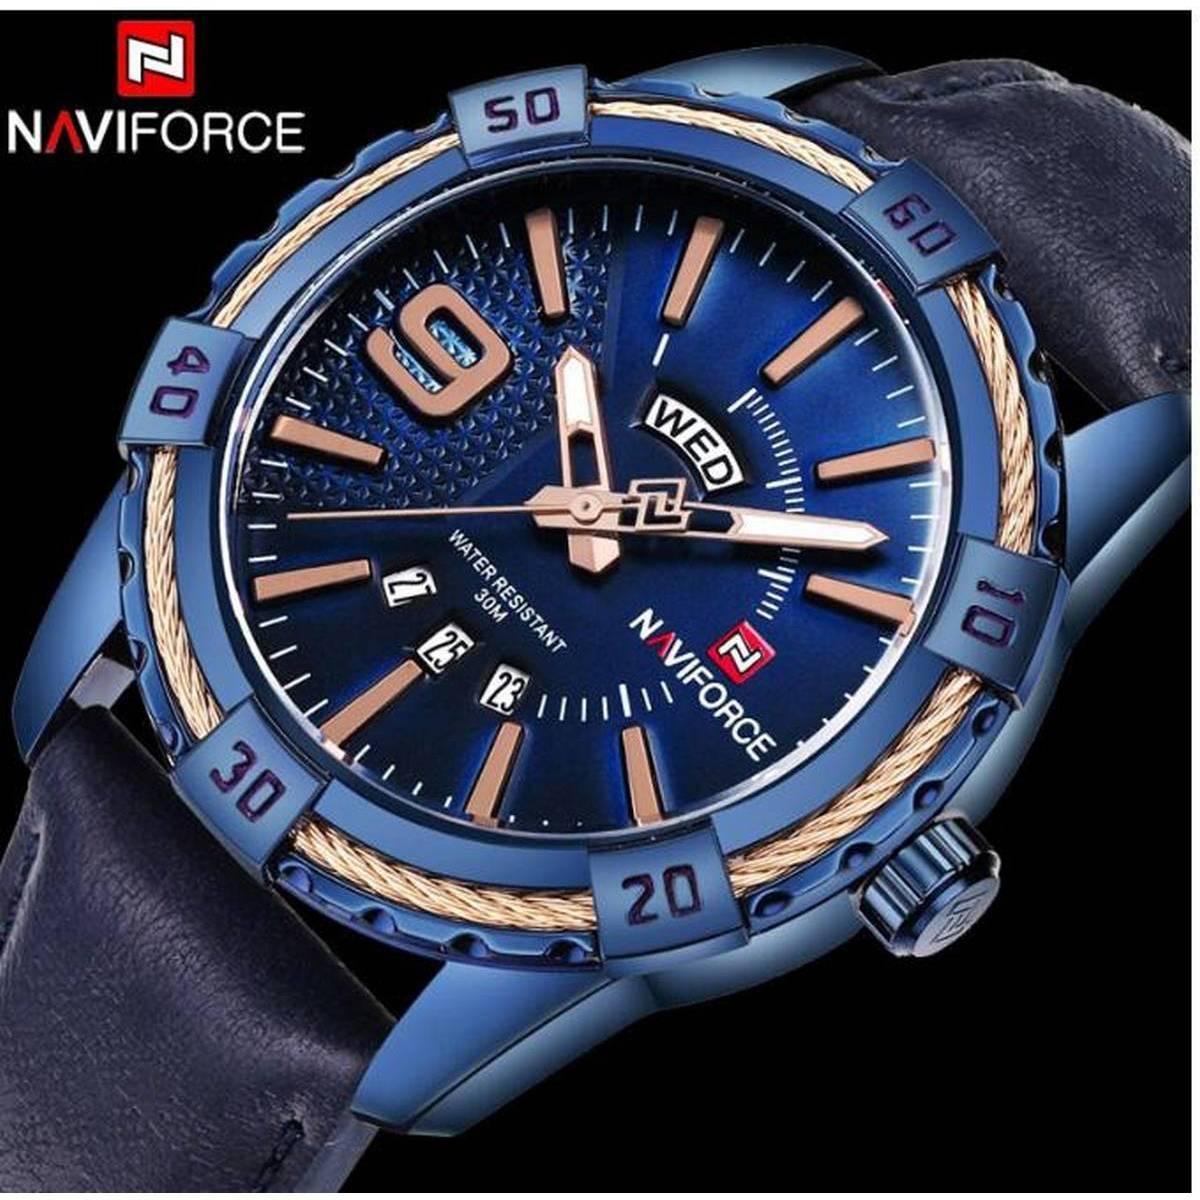 Naviforce Genuine Leather Day & Date Analog Quartz Wristwatch Waterproof With Brand Box - NF9117